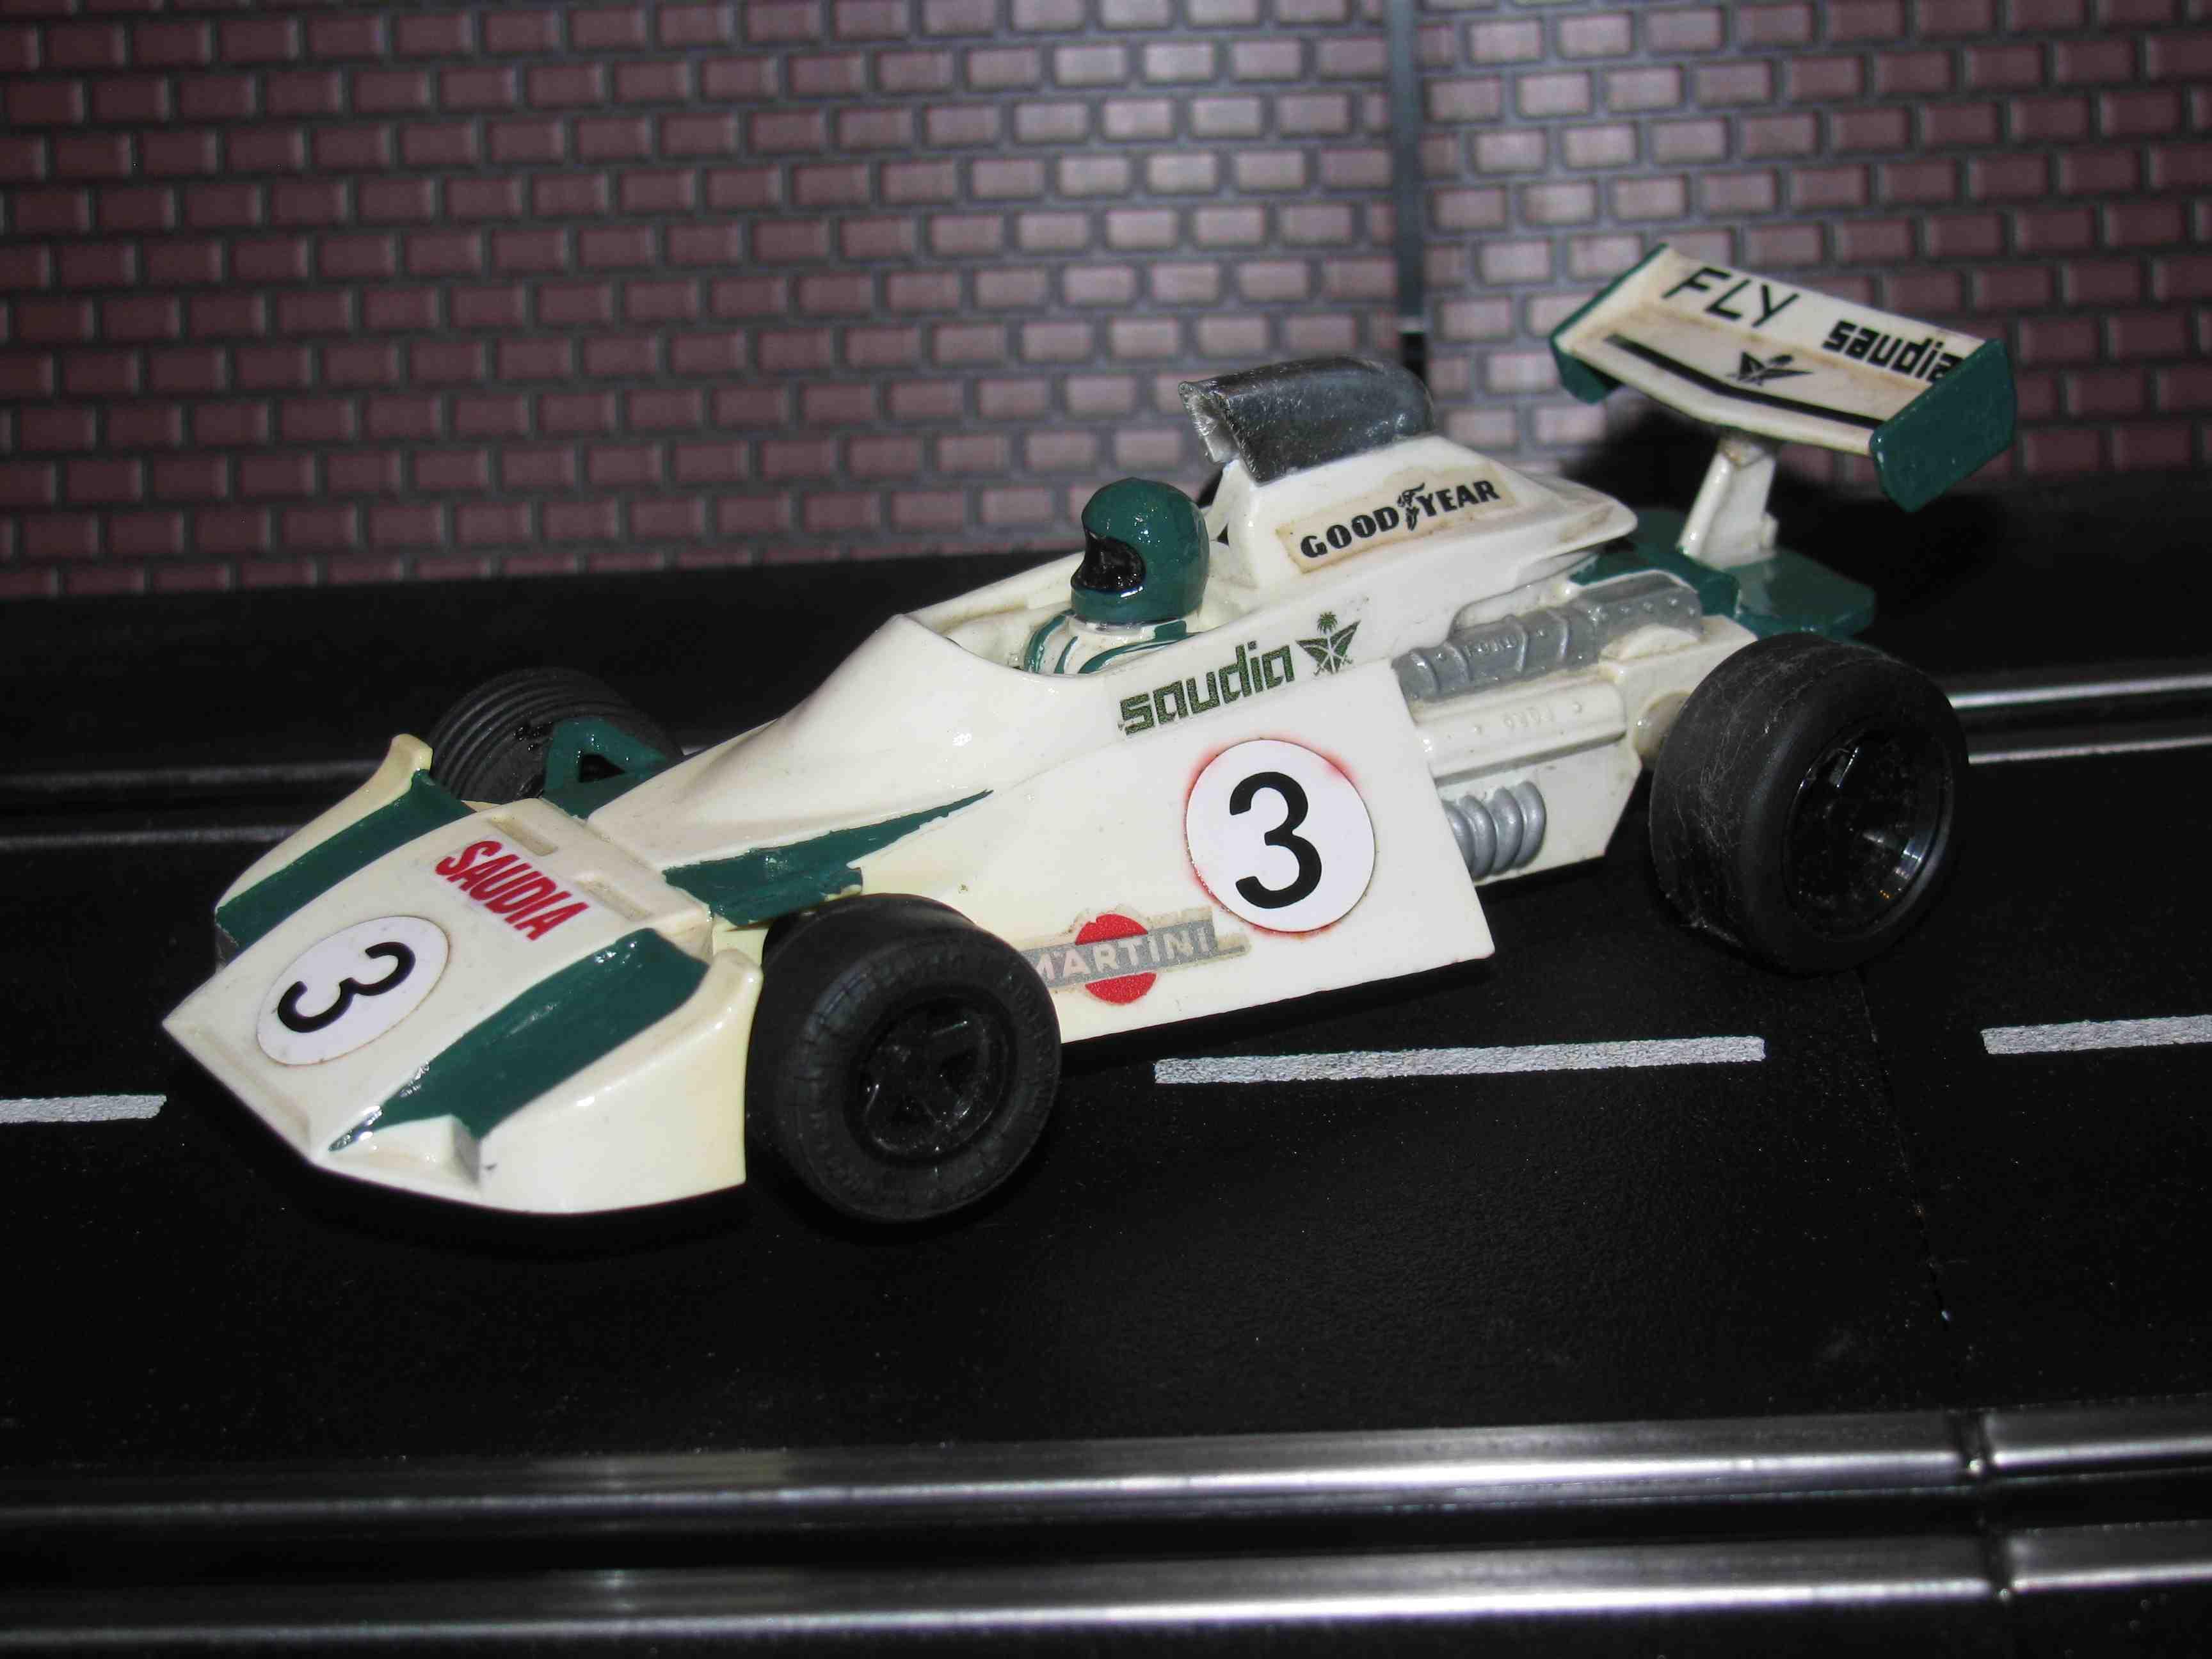 * SOLD * SCX 1977 BRM Formula 1 Slot Car 1/32 Scale – Car 3